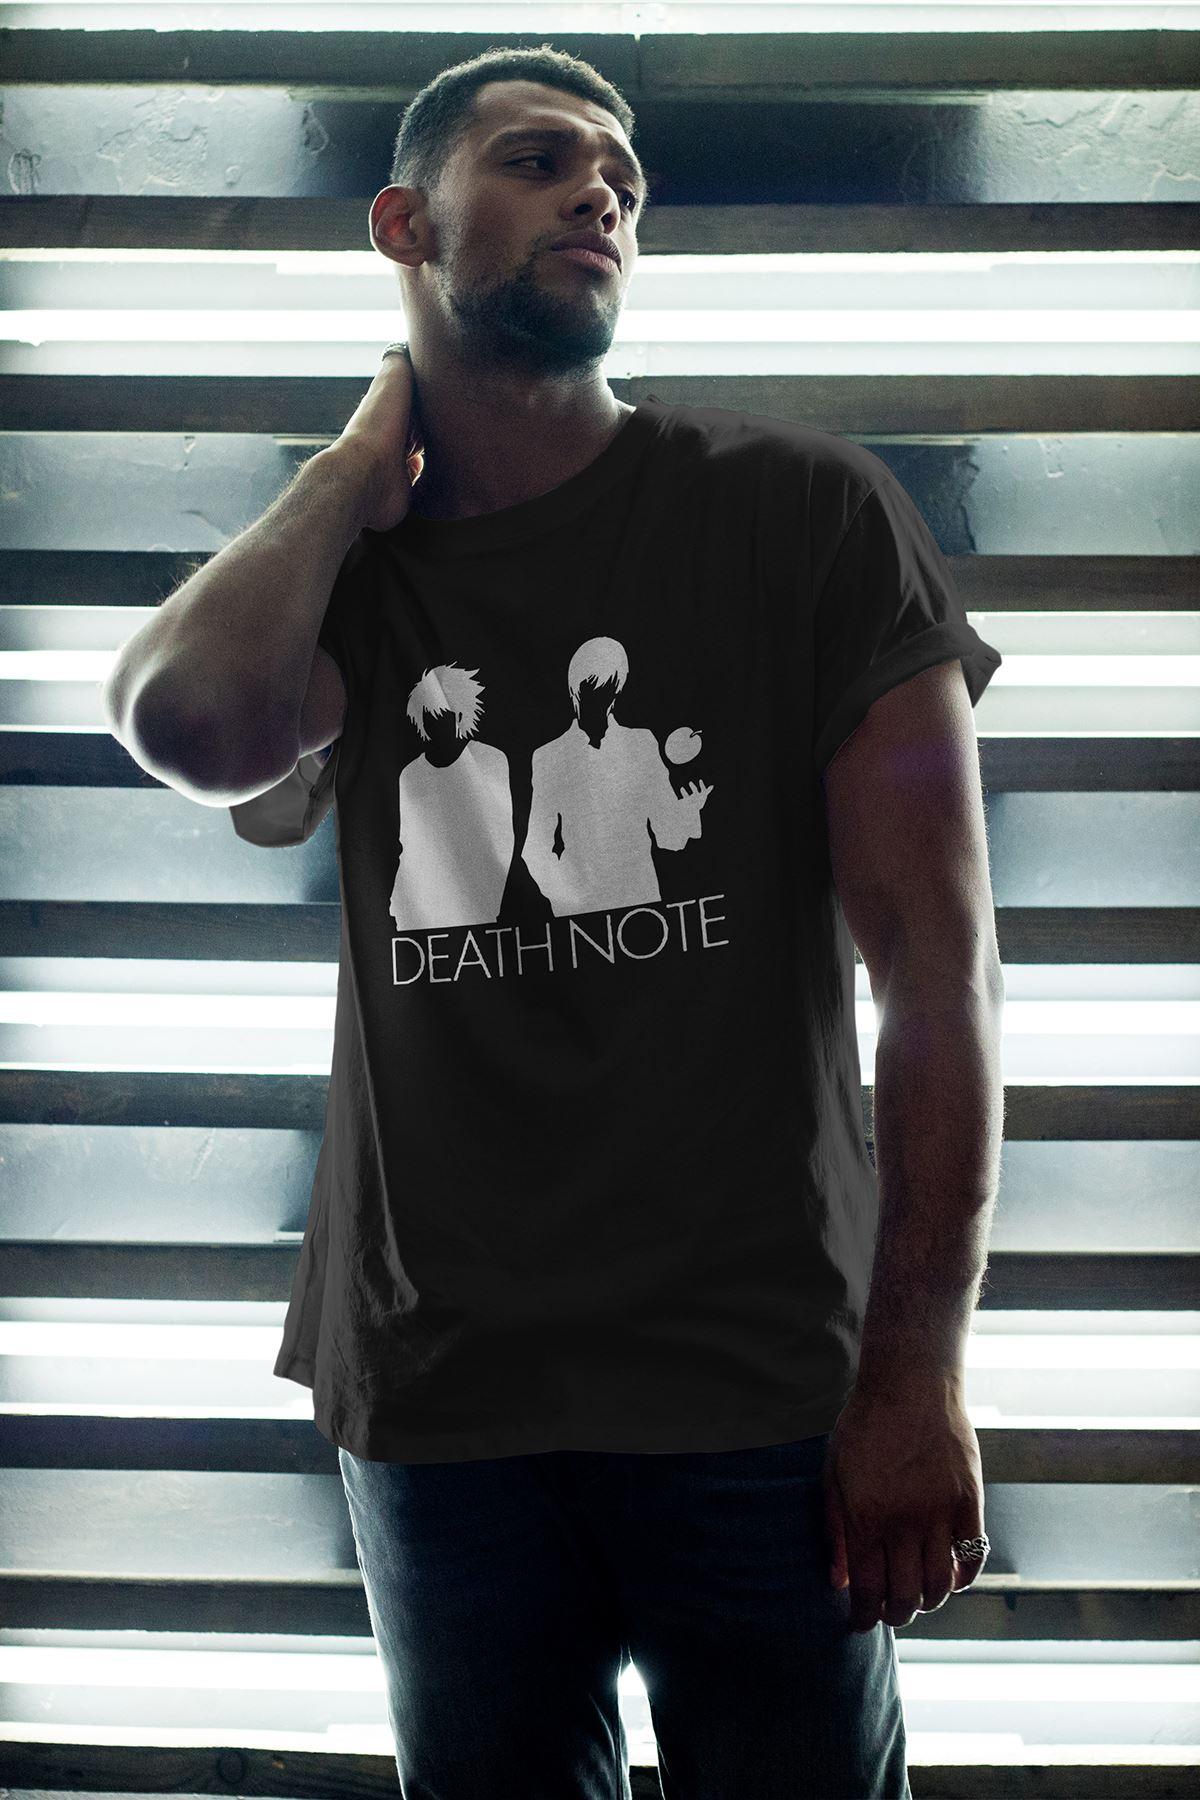 Anime Death Note 07 Siyah Erkek Oversize Tshirt - Tişört